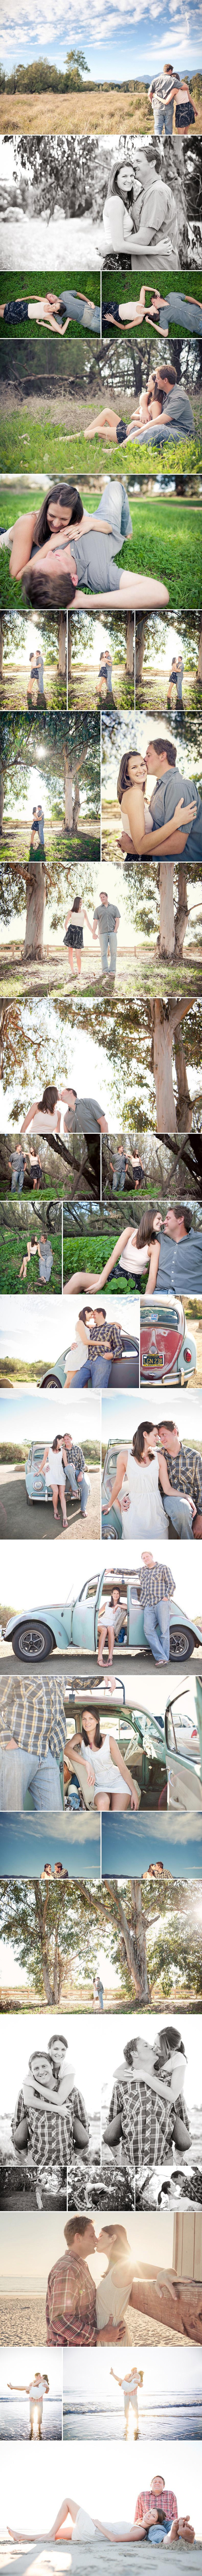 Bug Photography session vintage car engagement  Carpinteria beach engagement session  Marianne Wilson Photography